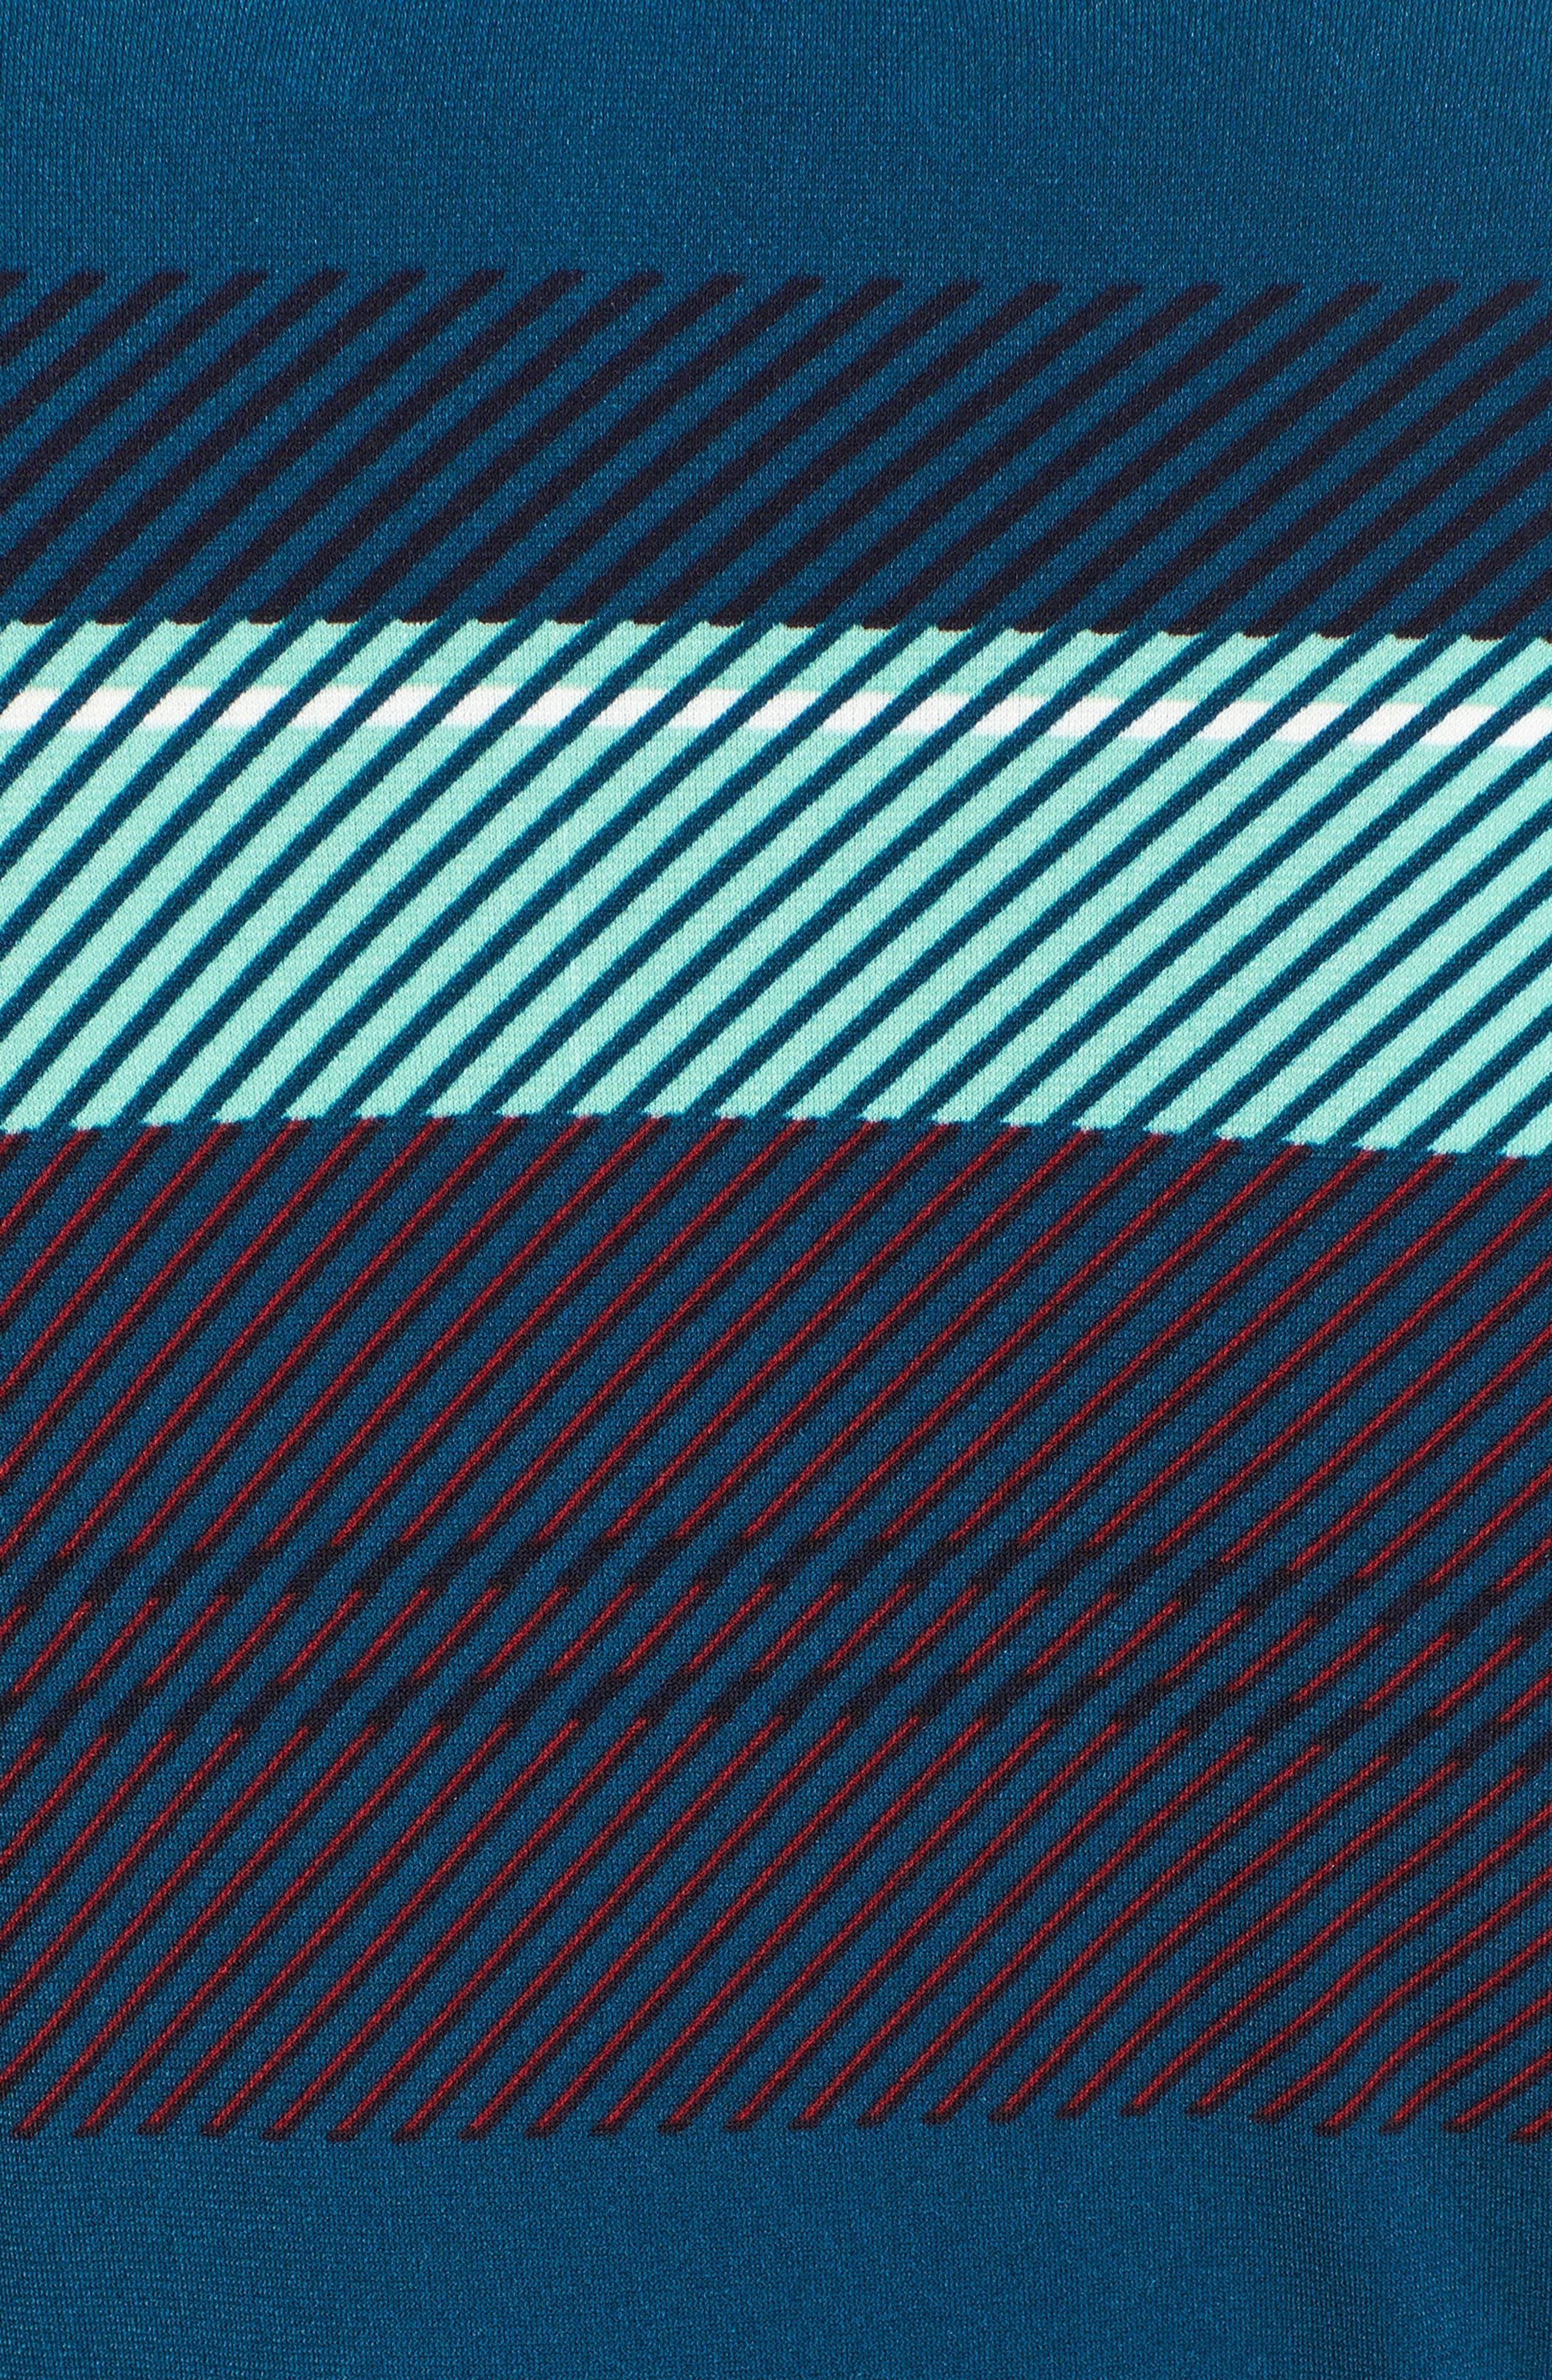 Banner Plaid Cowl Neck Top,                             Alternate thumbnail 5, color,                             LADYBUG